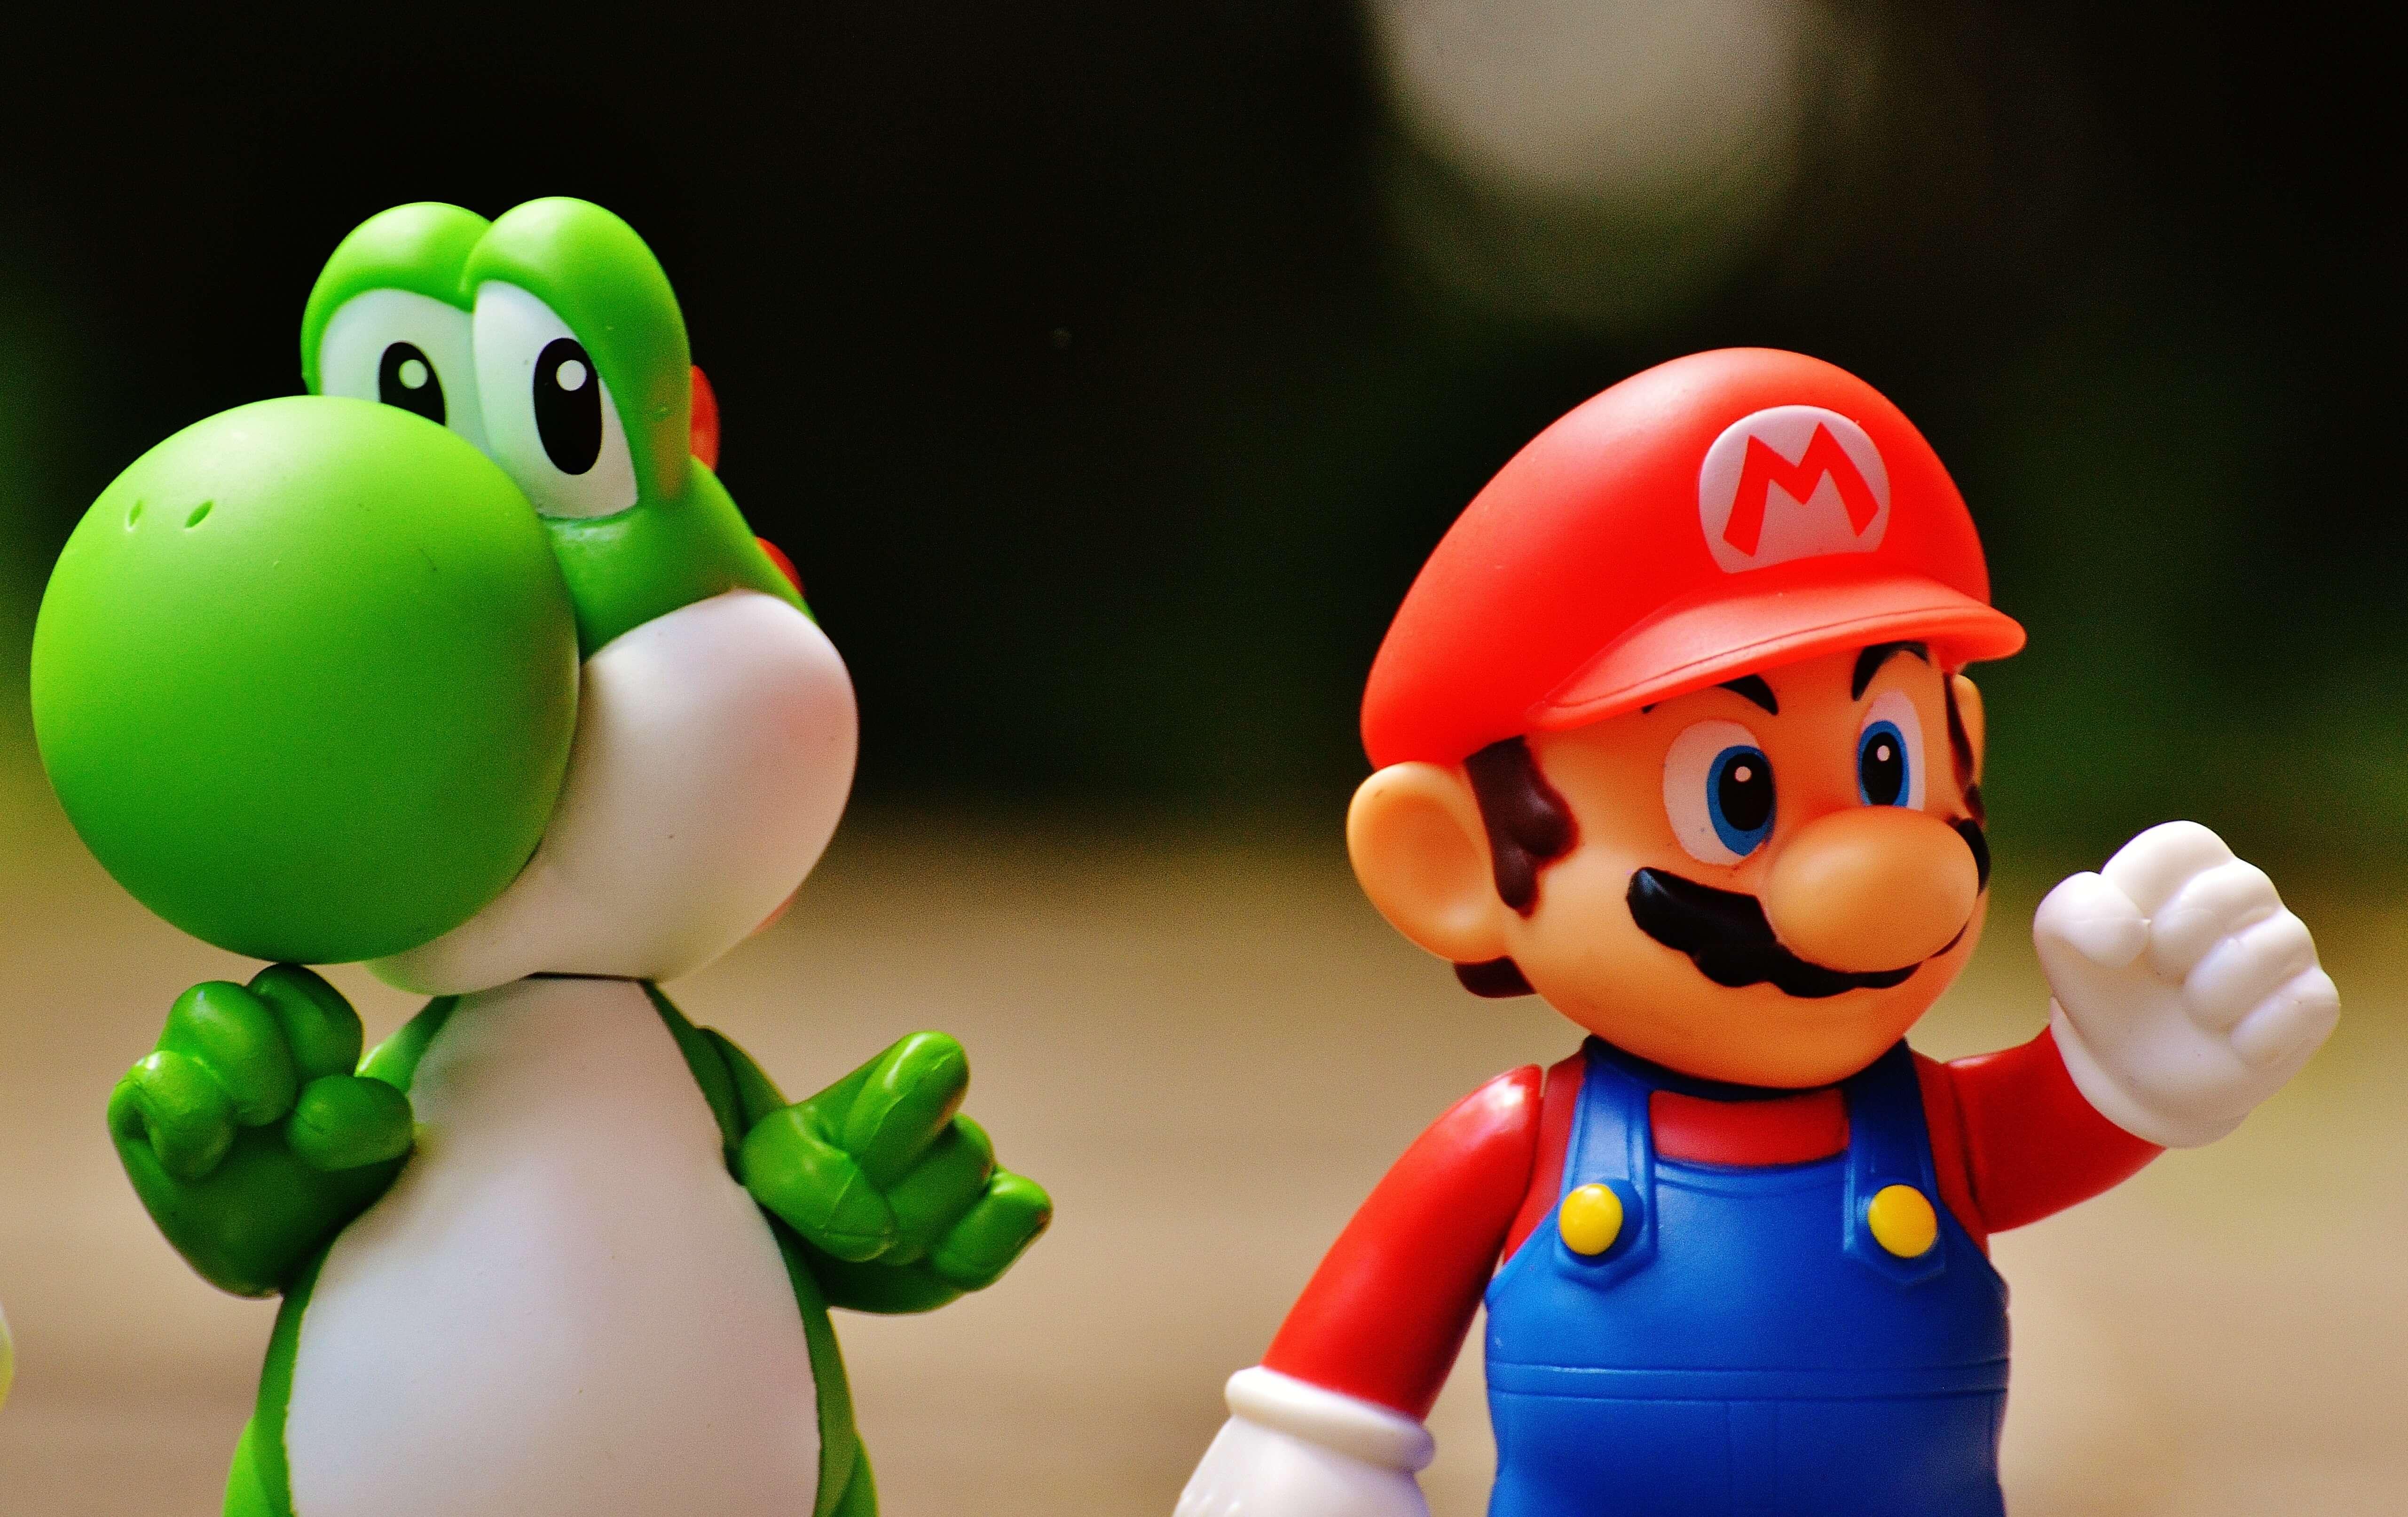 Yoshi & Mario characters